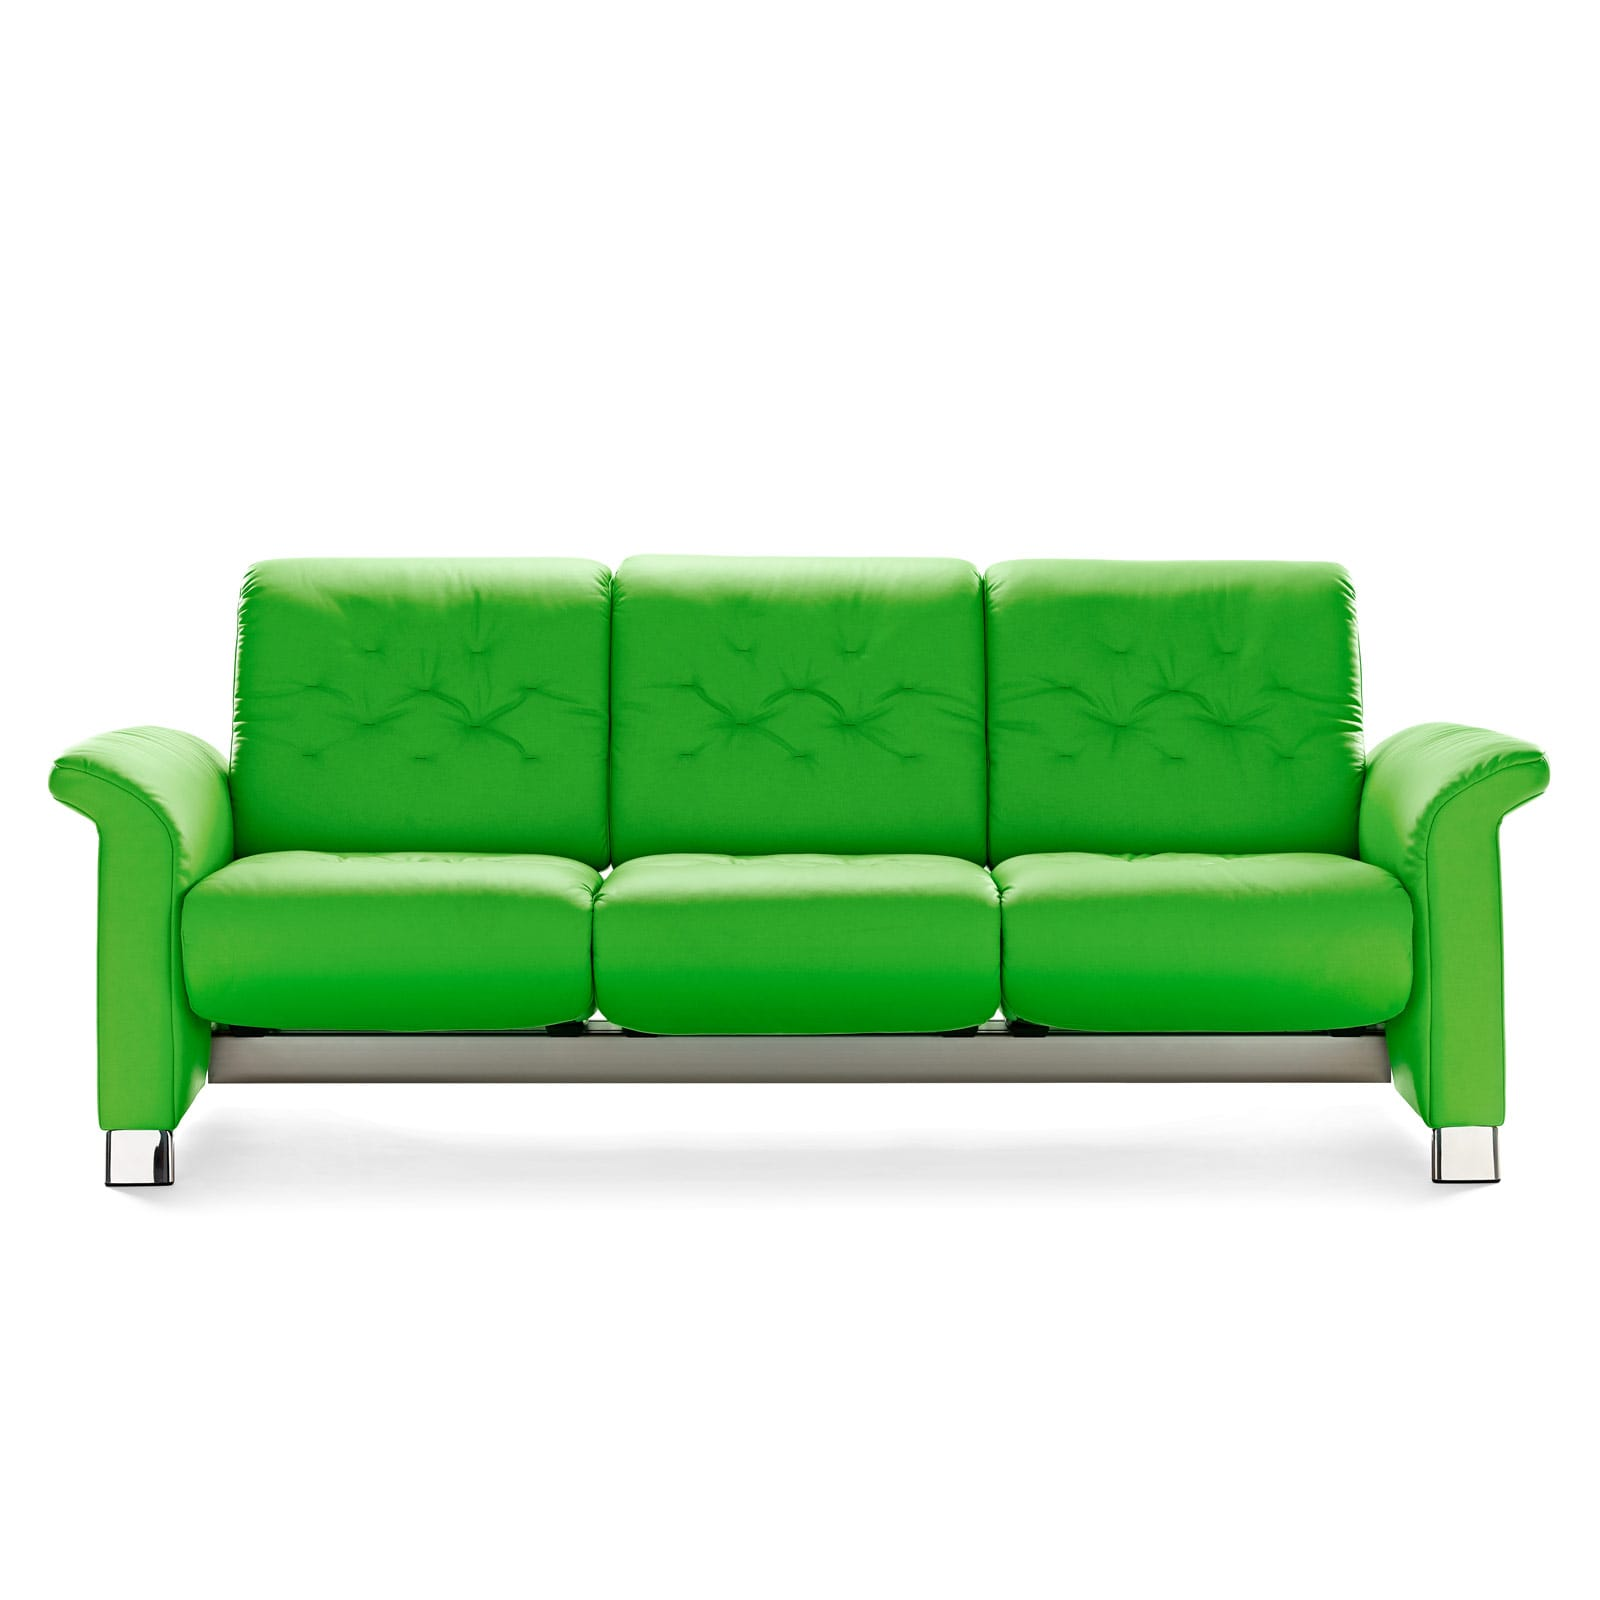 stressless sofa 3 sitzer metropolitan paloma summer green. Black Bedroom Furniture Sets. Home Design Ideas